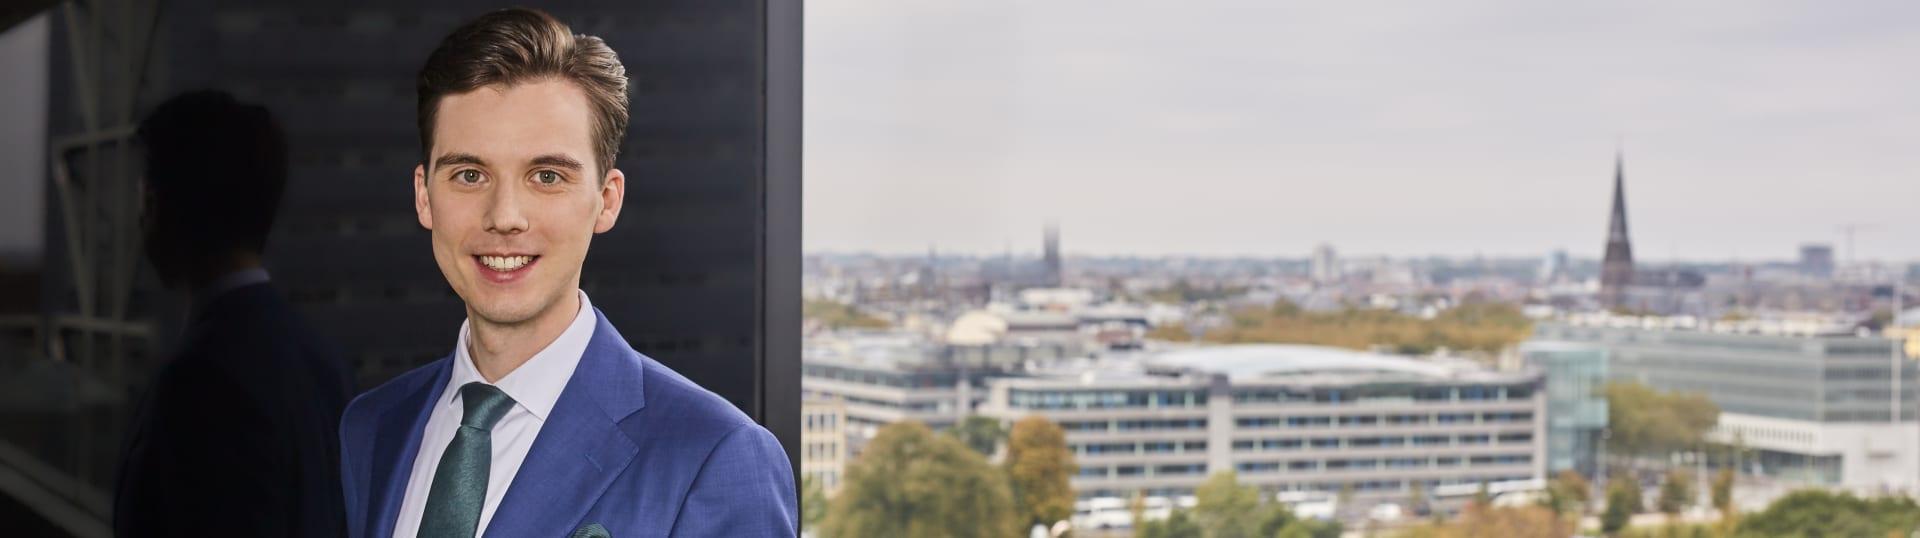 Max Beekes, advocaat Pels Rijcken